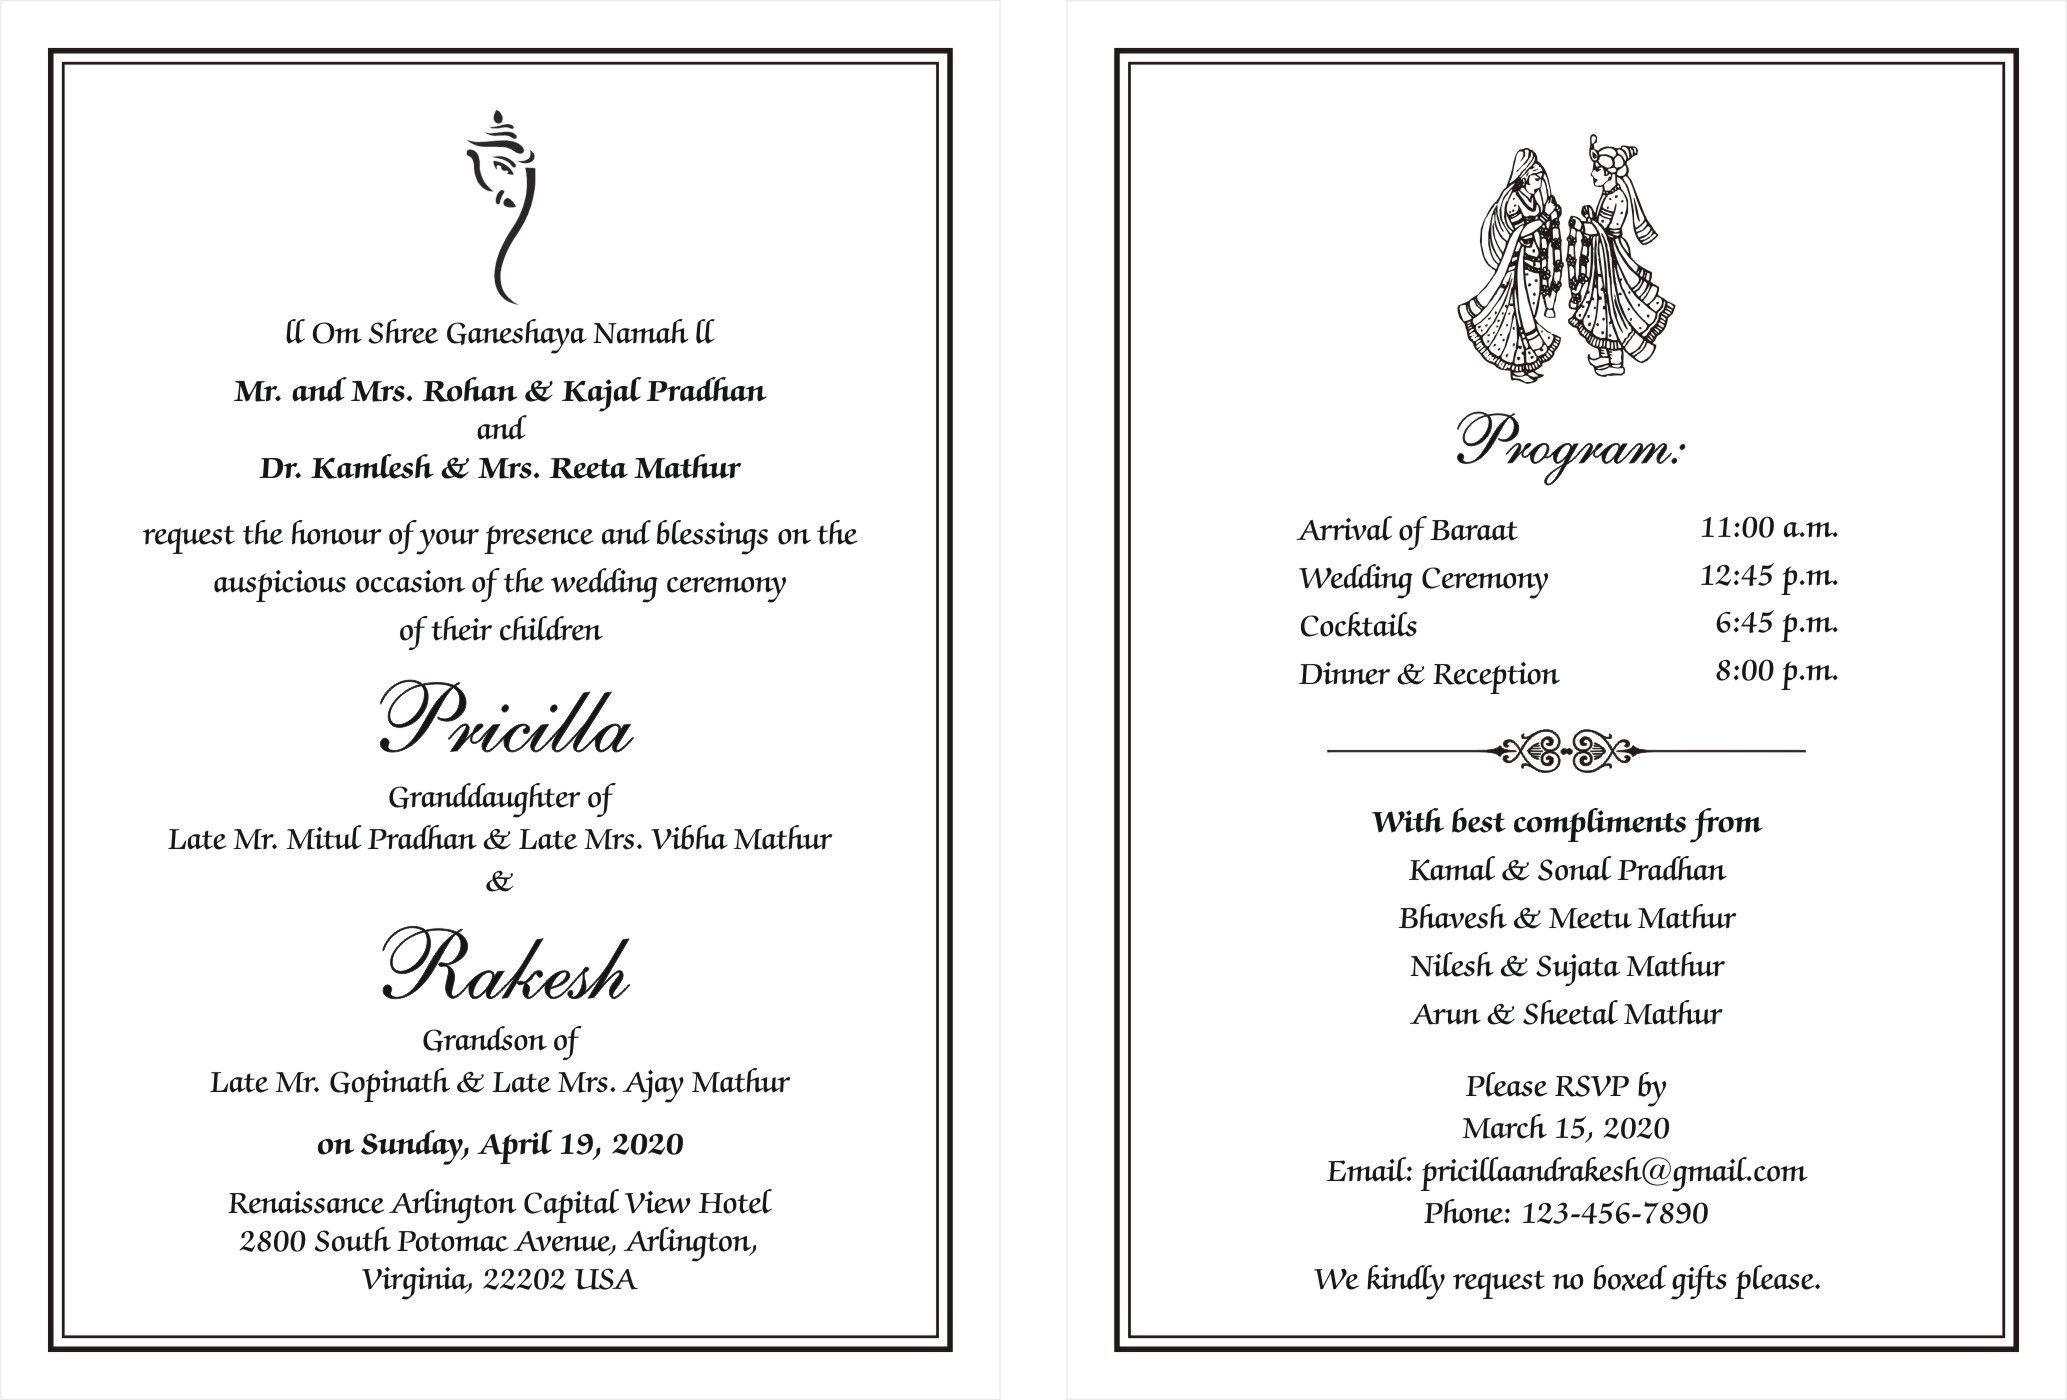 Wedding Invitation Cards Wording In 2021 Hindu Wedding Invitation Wording Hindu Wedding Invitations Indian Wedding Invitation Wording